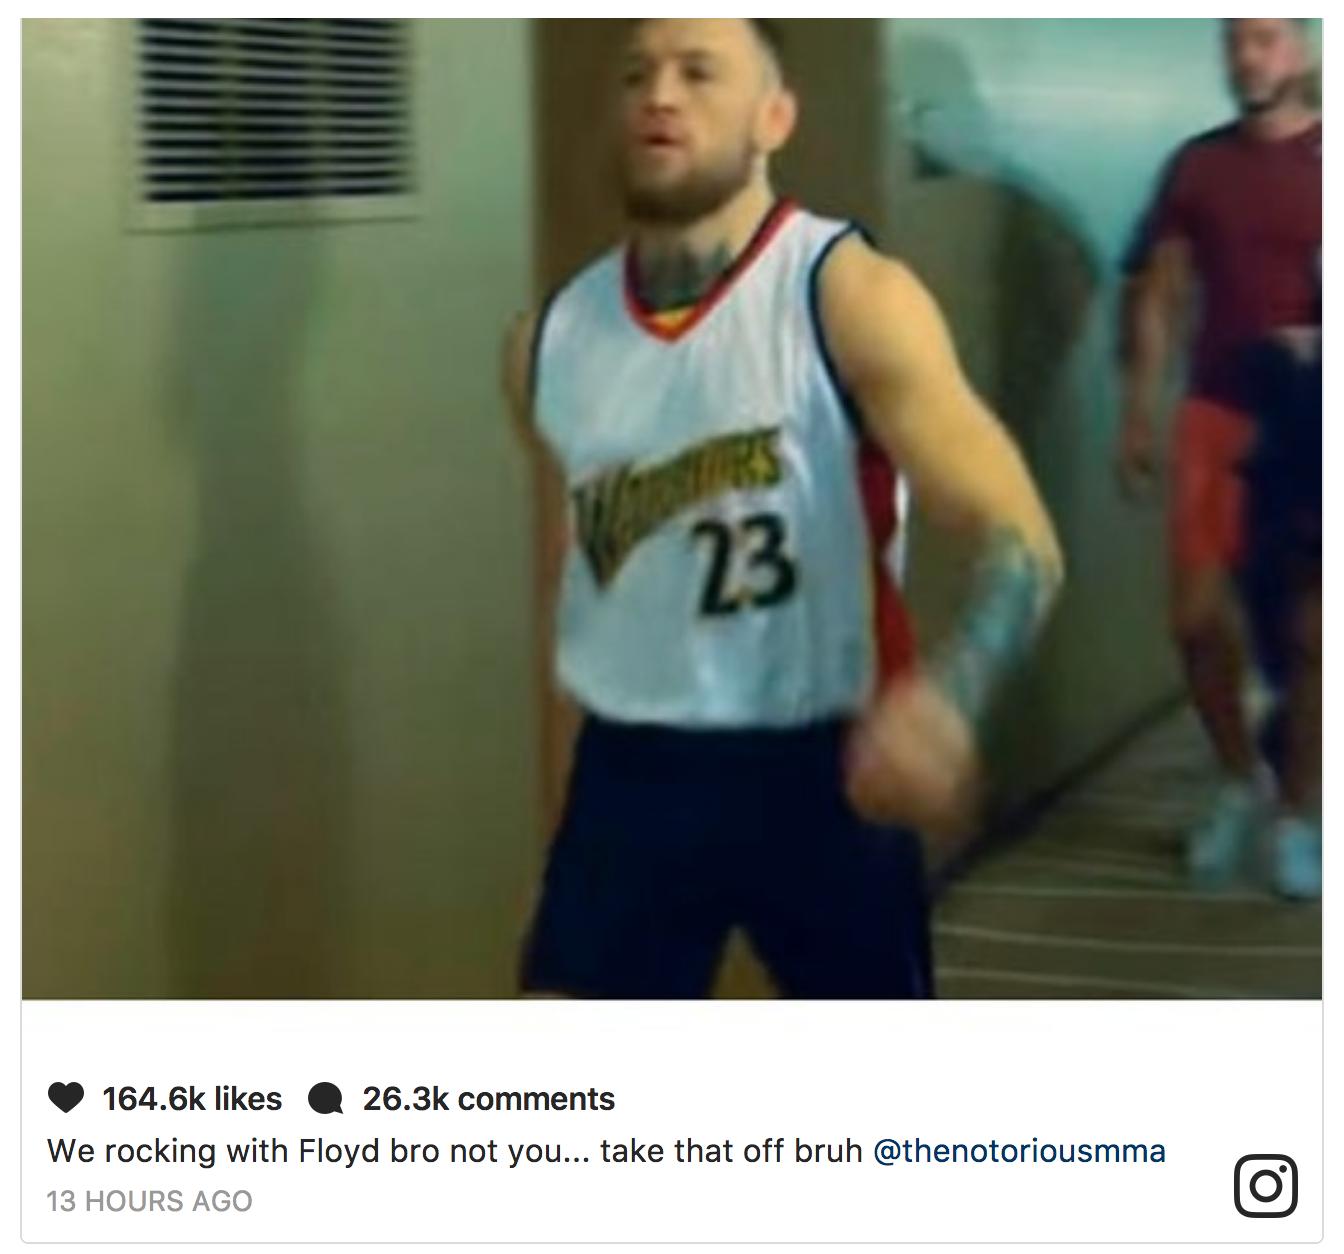 Conor McGregor wears C.J. Watson's jersey to Spite Floyd Mayweather, Draymond Green responds on Instagram